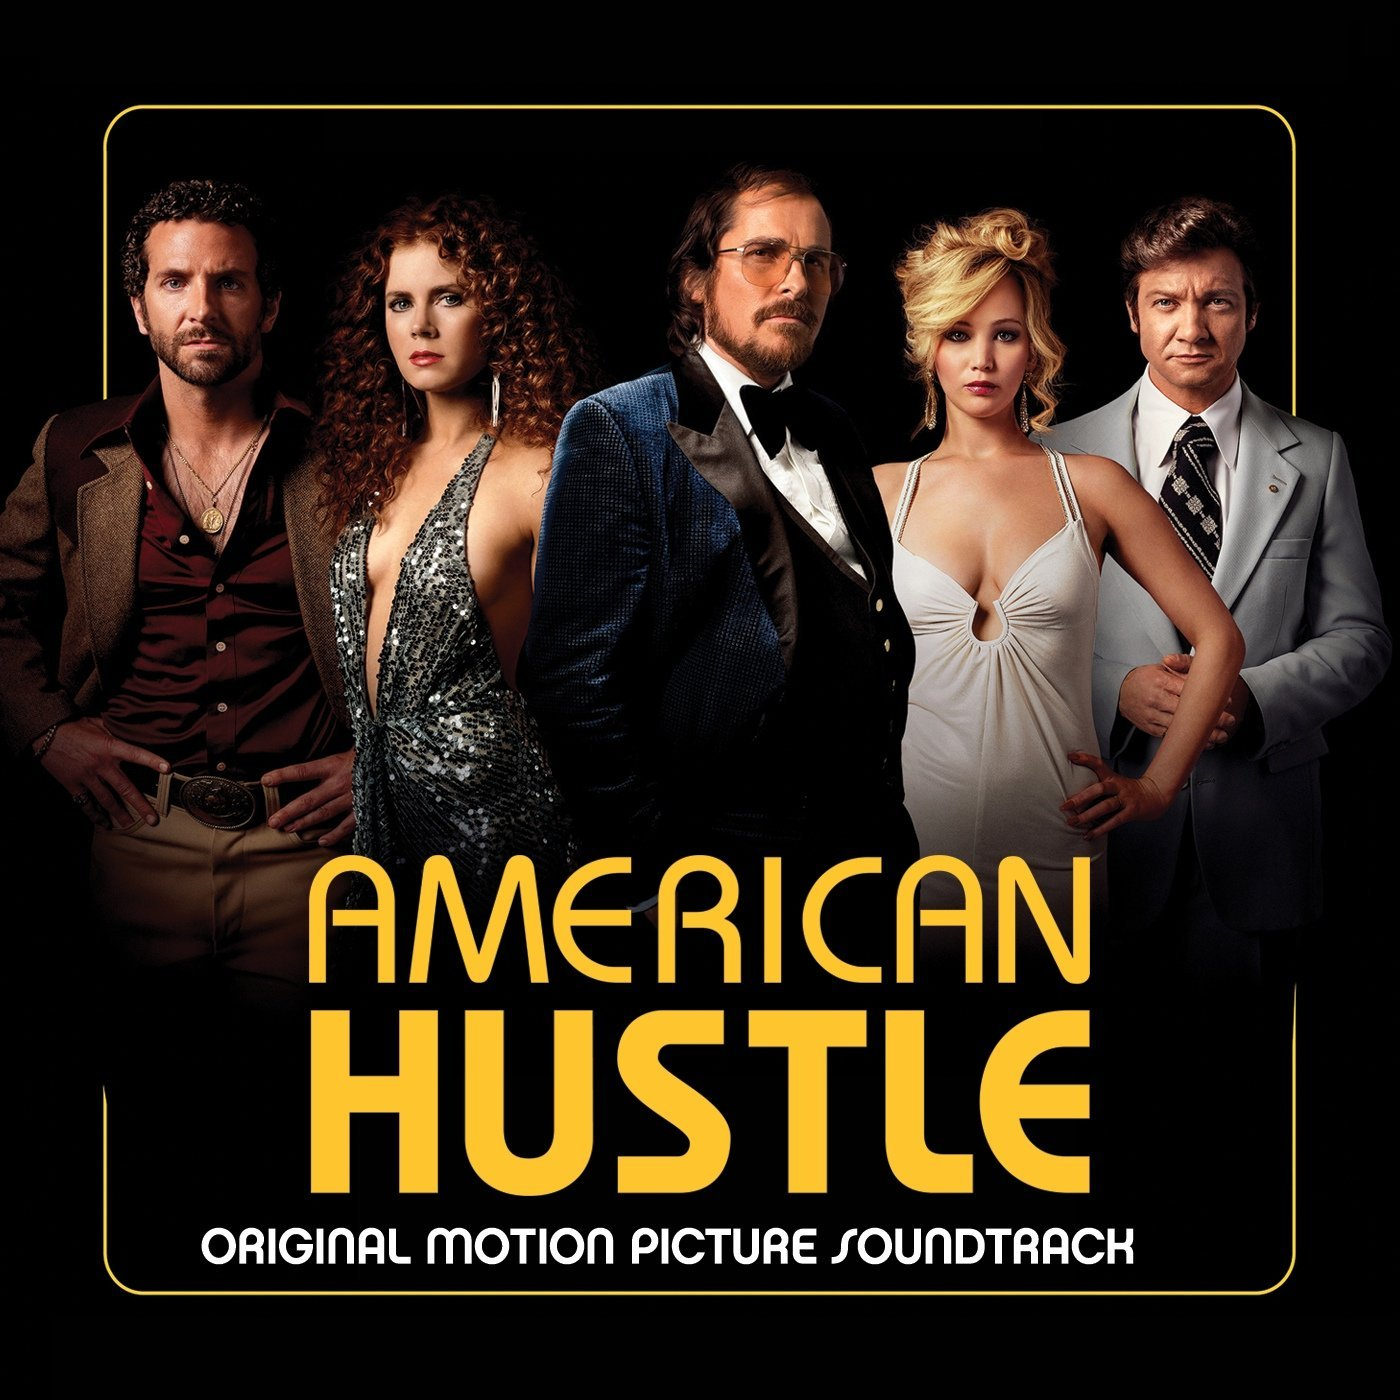 American hustle = American bluff bande originale du film de David O. Russell ; Danny Elfman, comp. Duke Ellington, piano Elton John, piano, chant Mayssa Karaa, chant... [et al.] David O. Russell, réalisateur